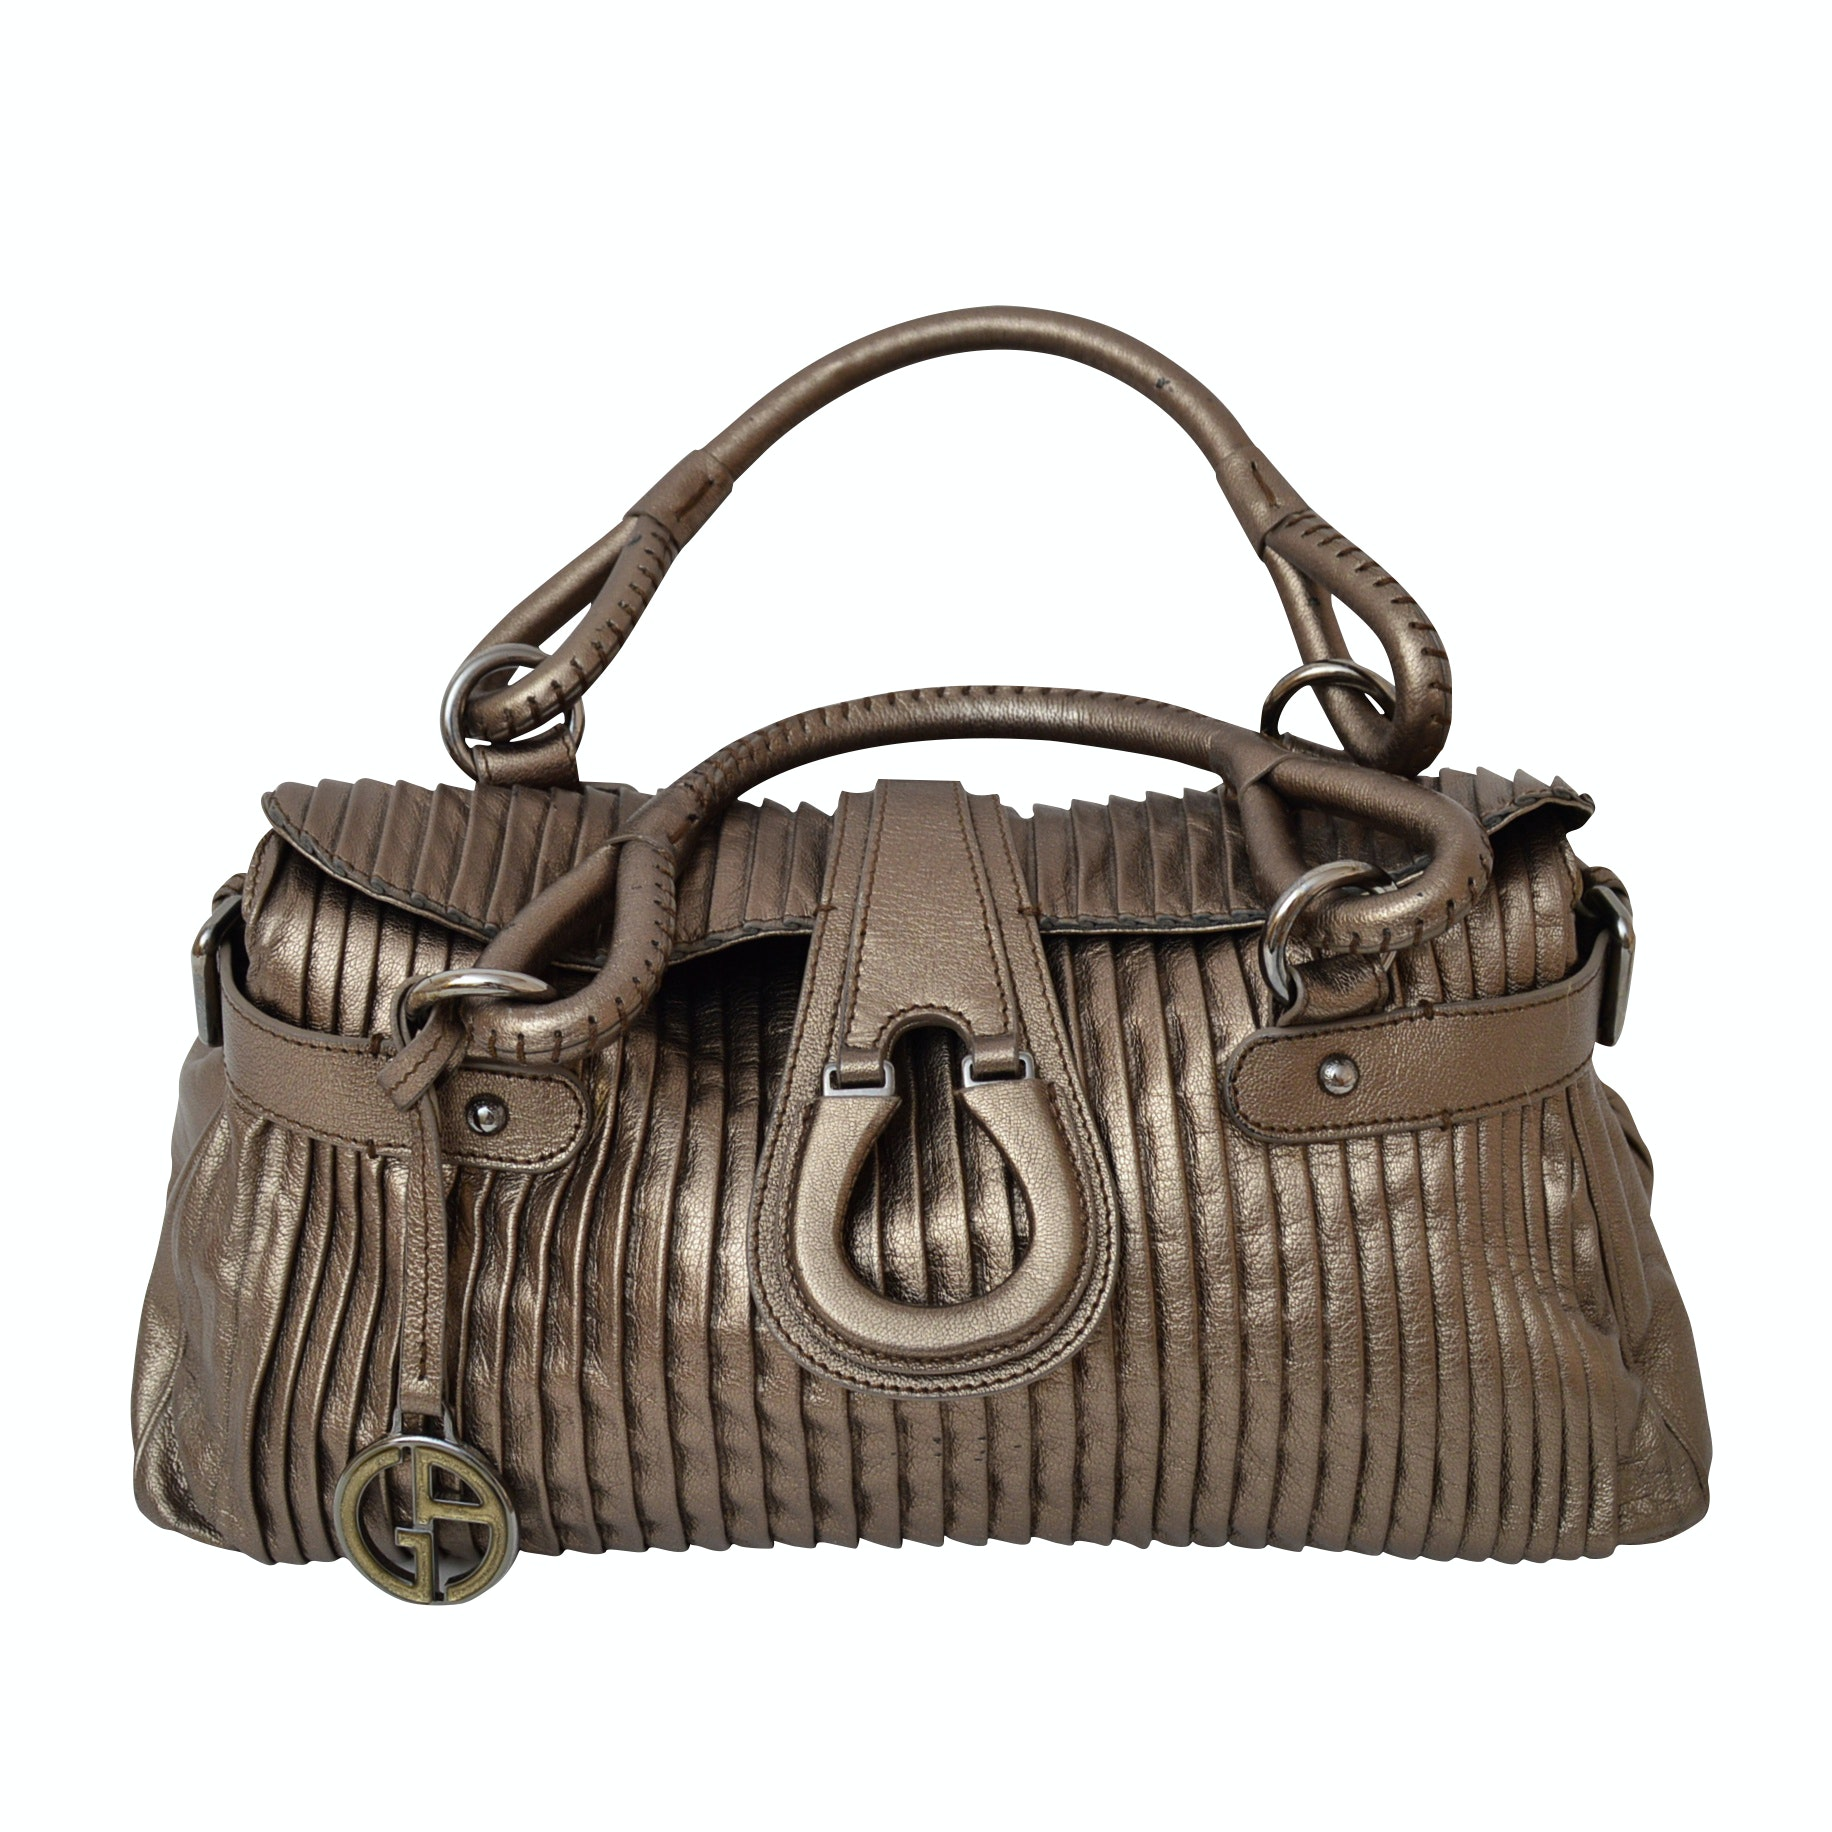 Giorgio Armani Bronze Metallic Leather Handbag